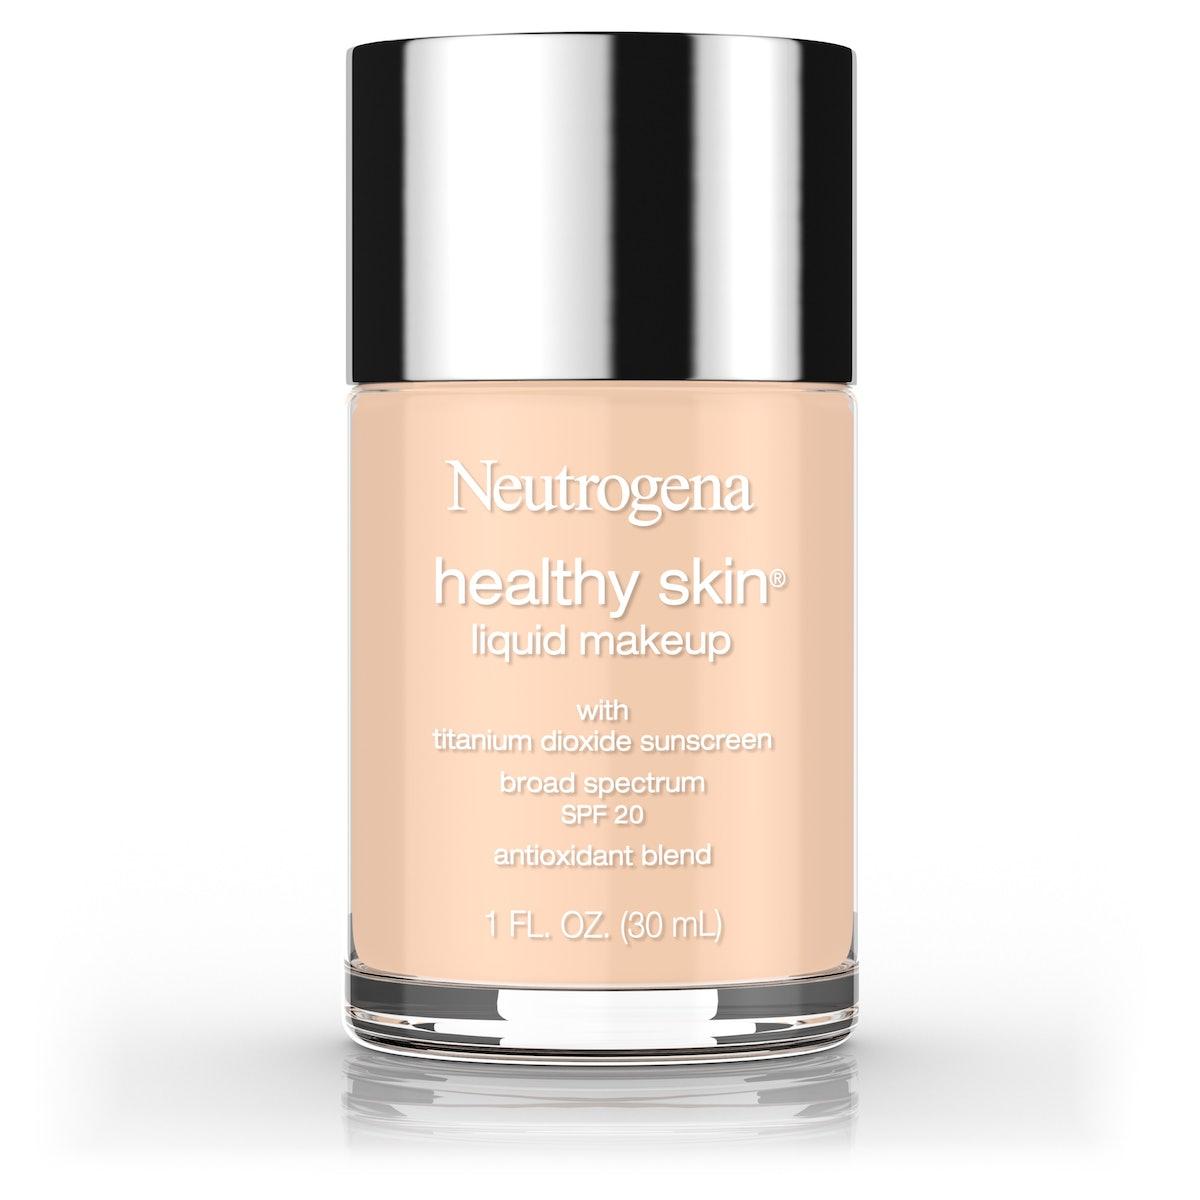 Neutrogena Healthy Skin Liquid Makeup Foundation, Broad Spectrum SPF 20